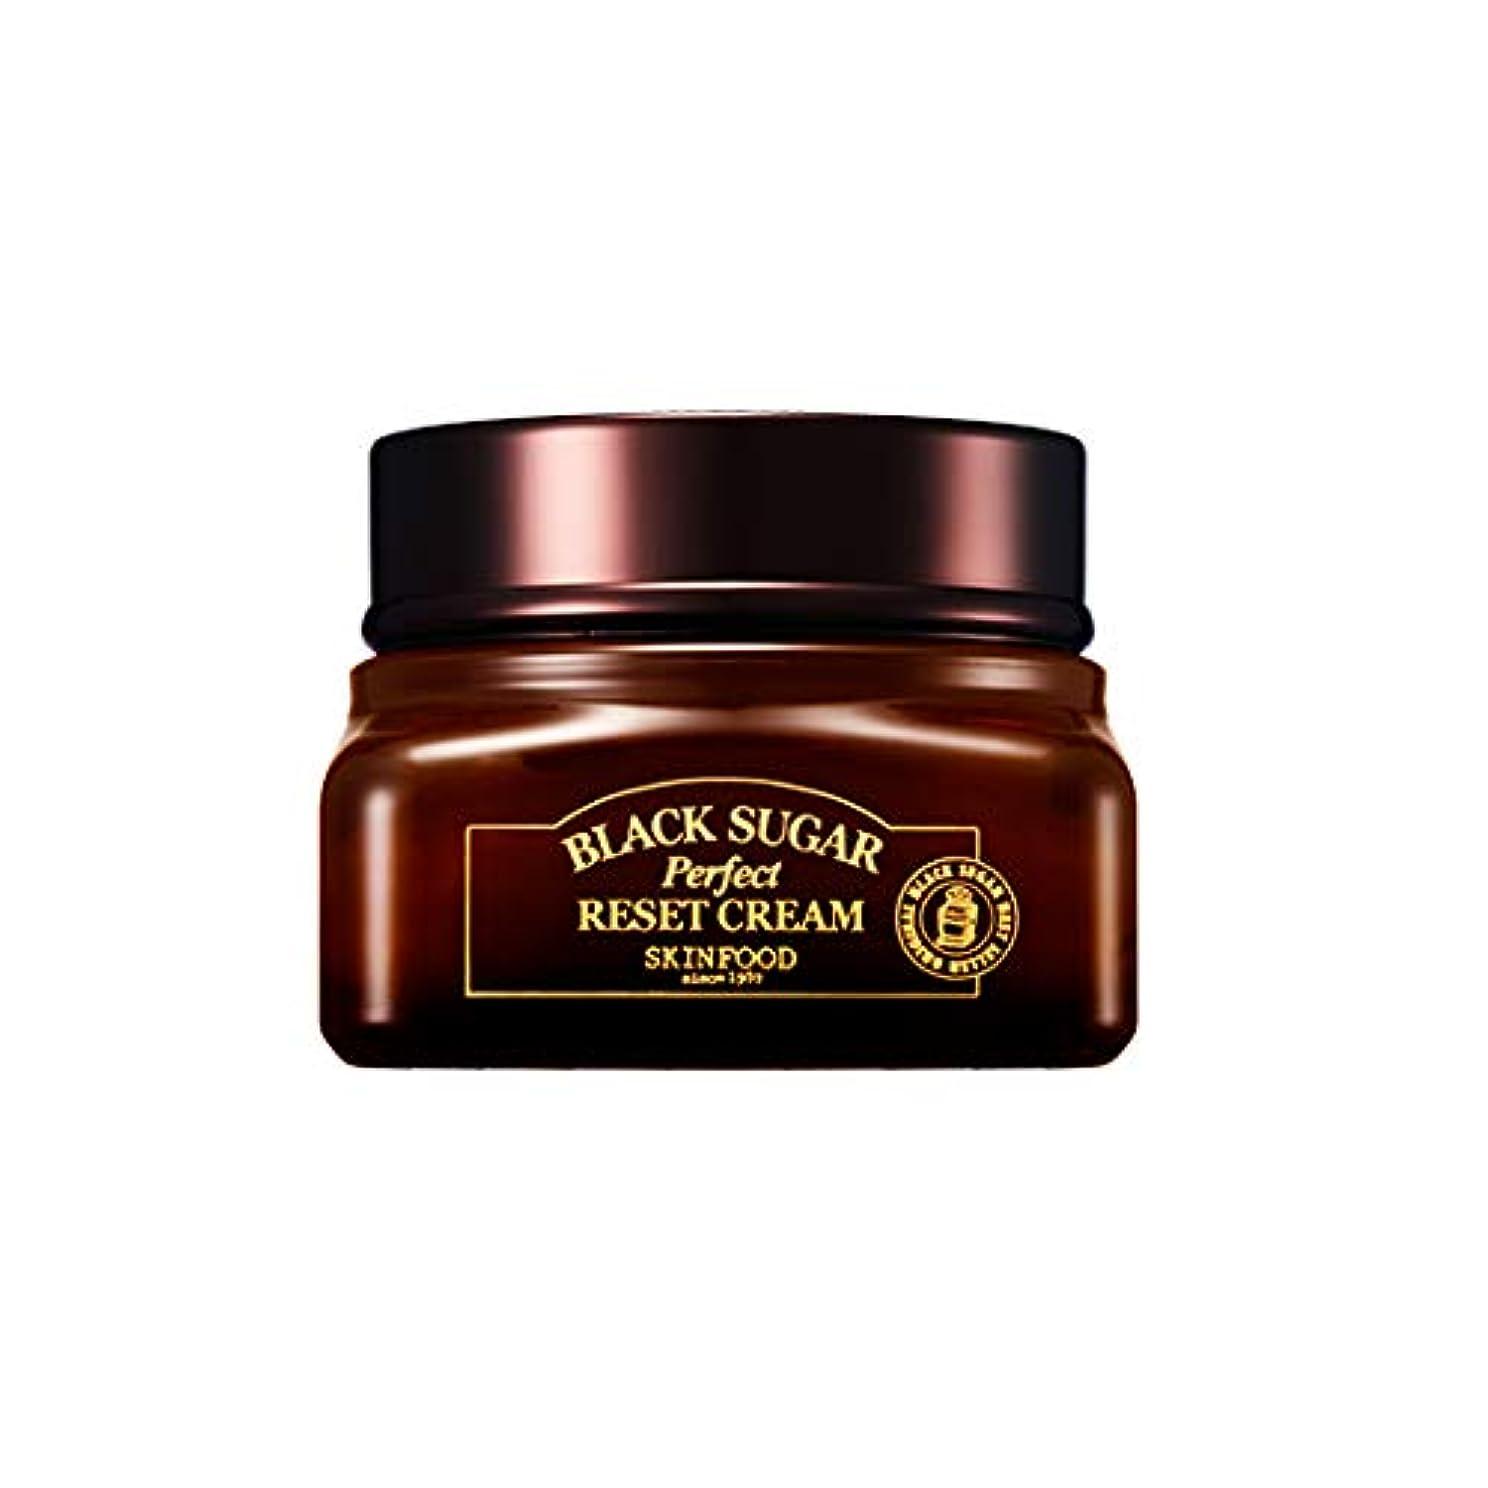 Skinfood 黒糖パーフェクトリセットクリーム/Black Sugar Perpect Reset Cream 60ml [並行輸入品]